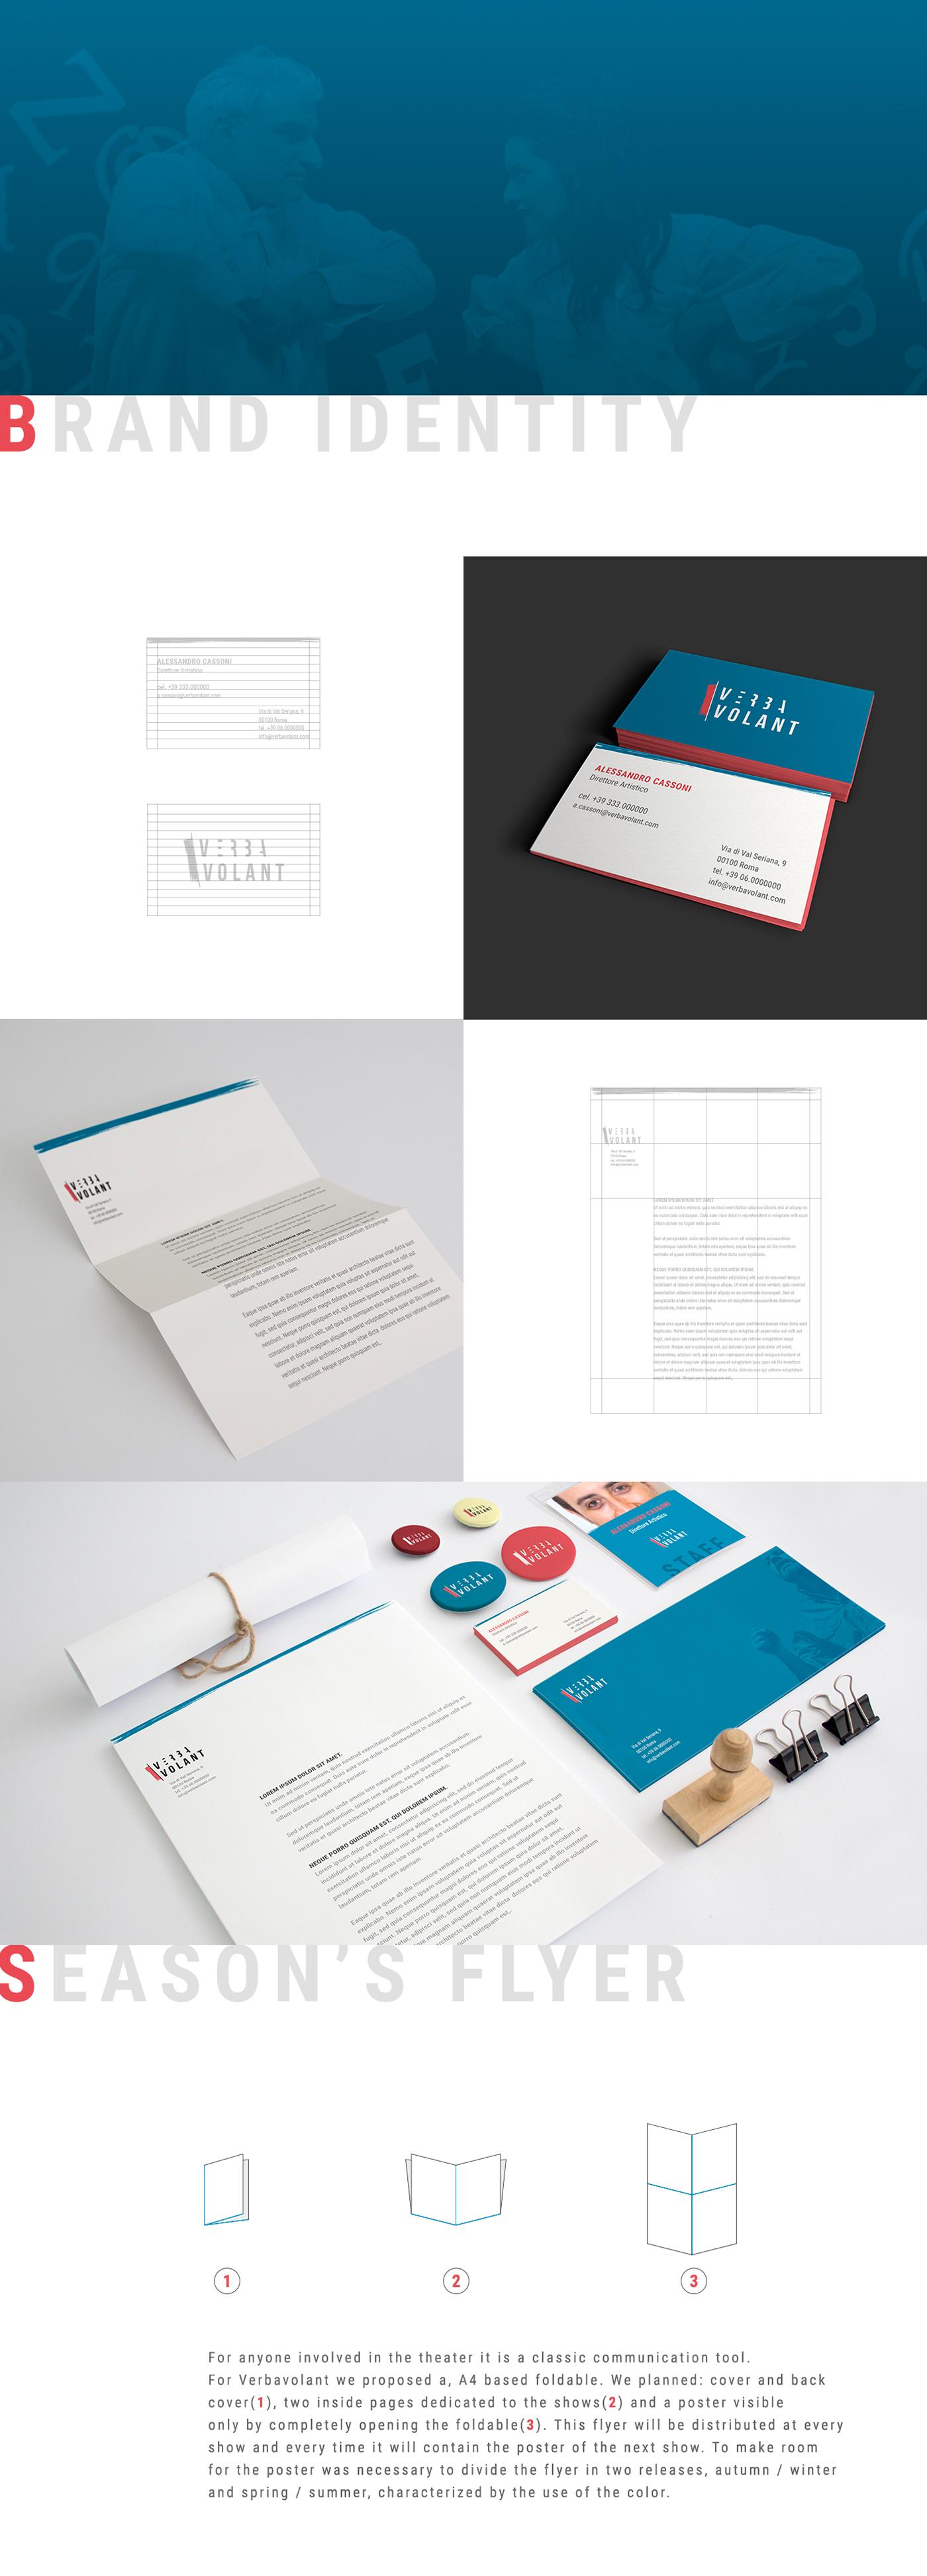 graphic design  branding  brand logo identity school theater  visual identity RESTYLING brush